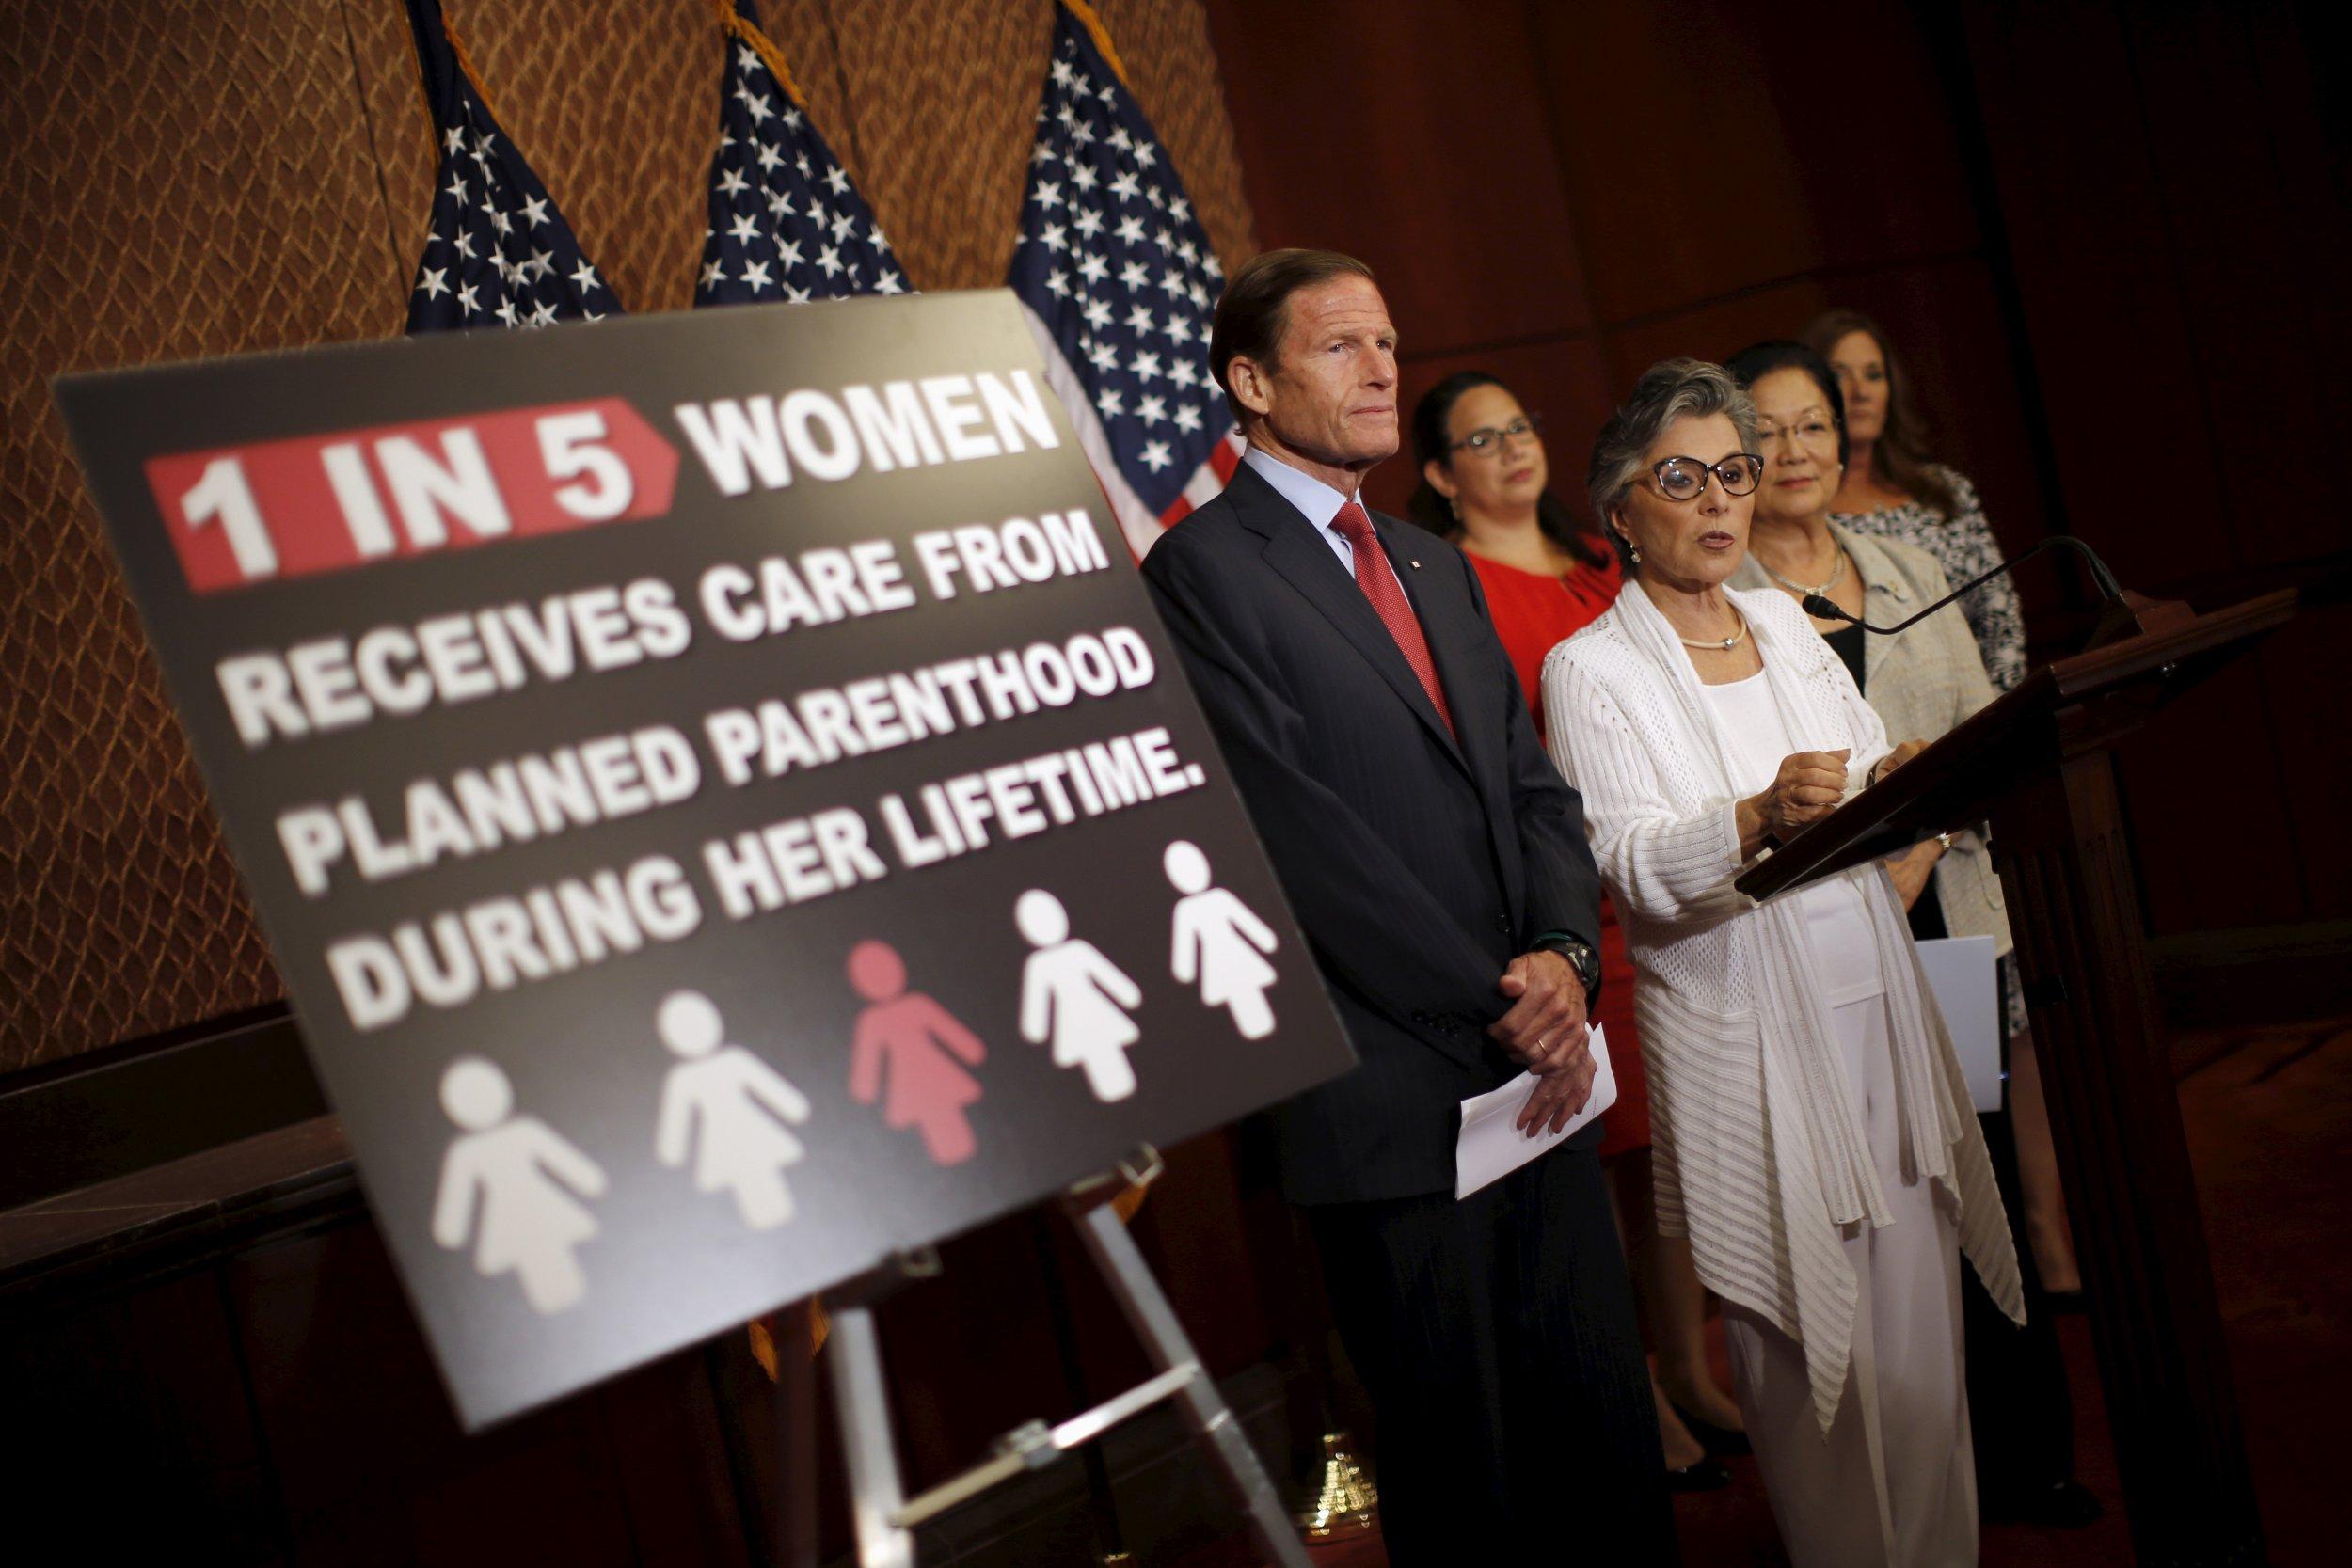 Planned_Parenthood_Legal_Action